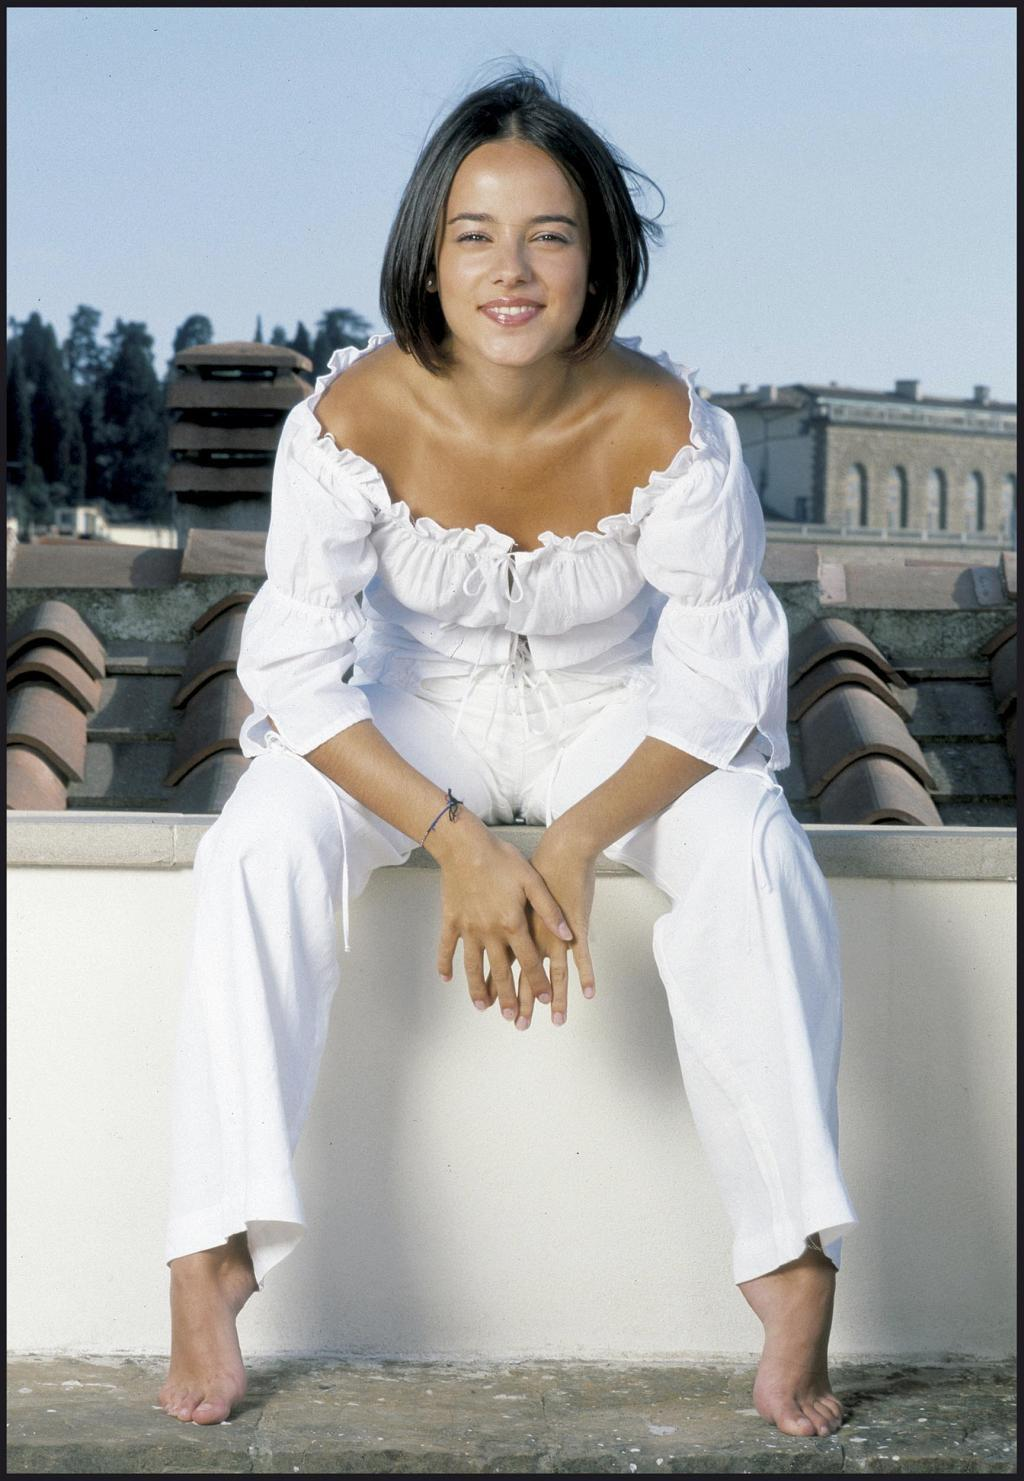 https://pics.wikifeet.com/Aliz%C3%A9e-Feet-44868.jpg